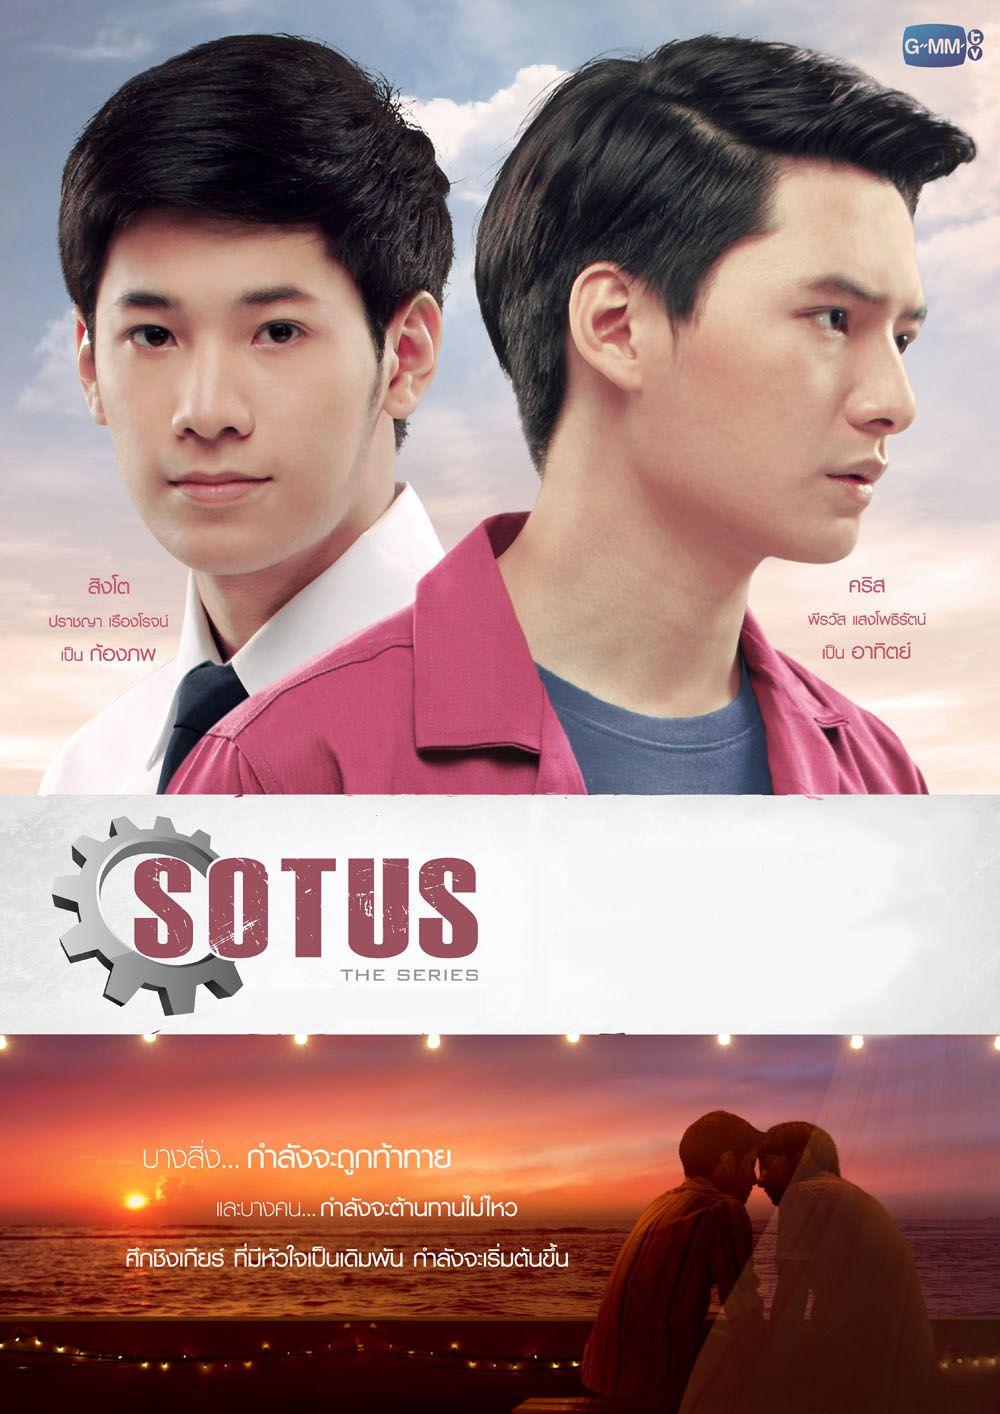 Pin by LINE TV on 戲劇橫/直圖   Thai drama, Series movies